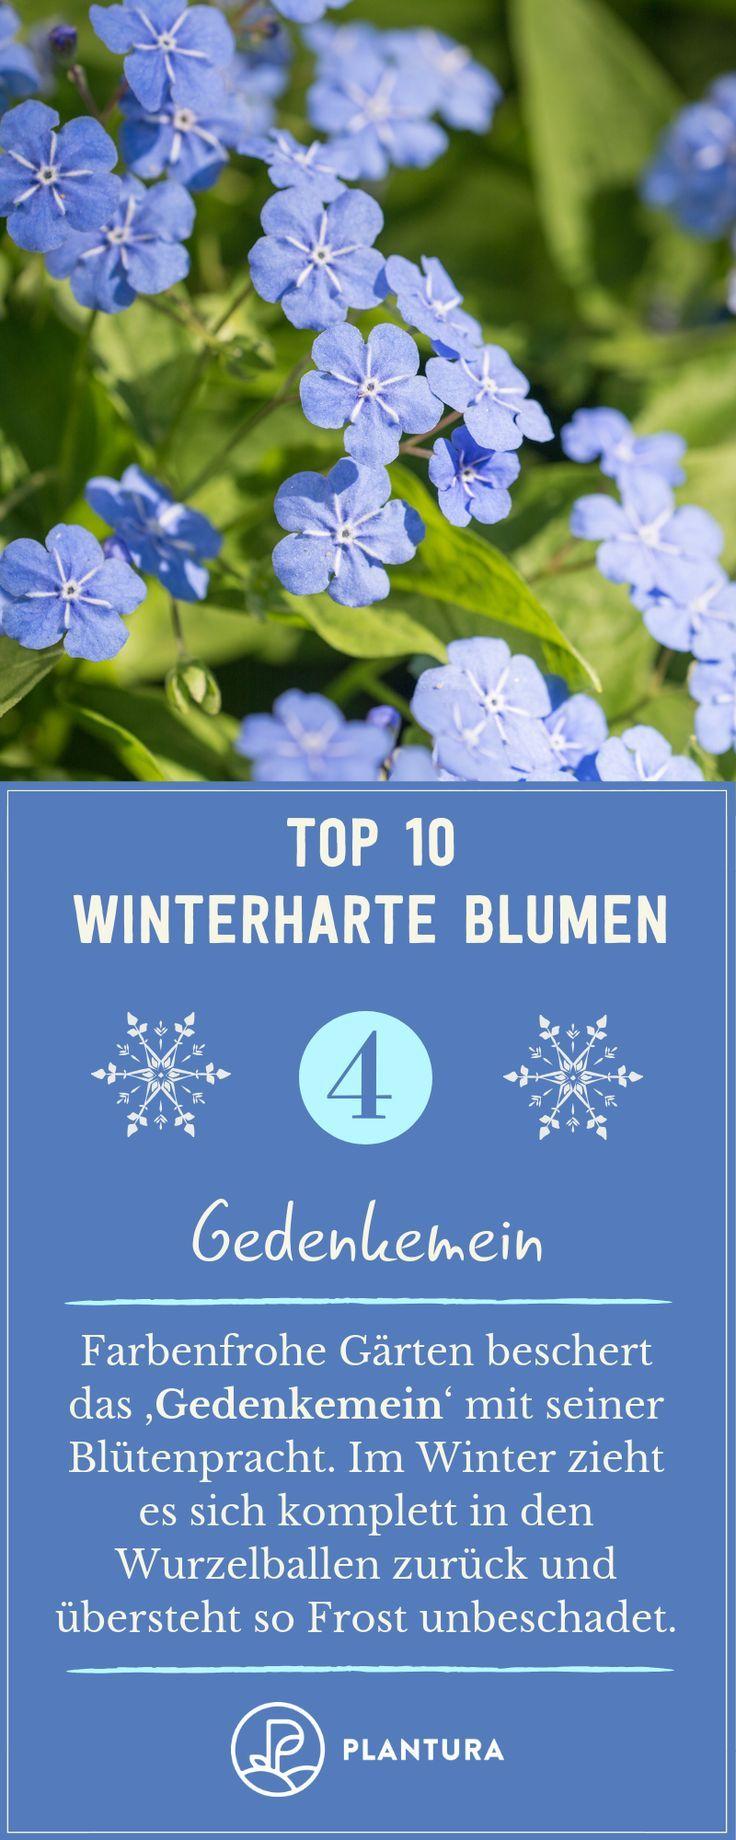 Winterharte Blumen Die Robusten Top 10 Fur Ihren Garten Blumen Die Fur Garten Ihren Robusten Top Winterharte Blumen Winterhart Winterharte Pflanzen